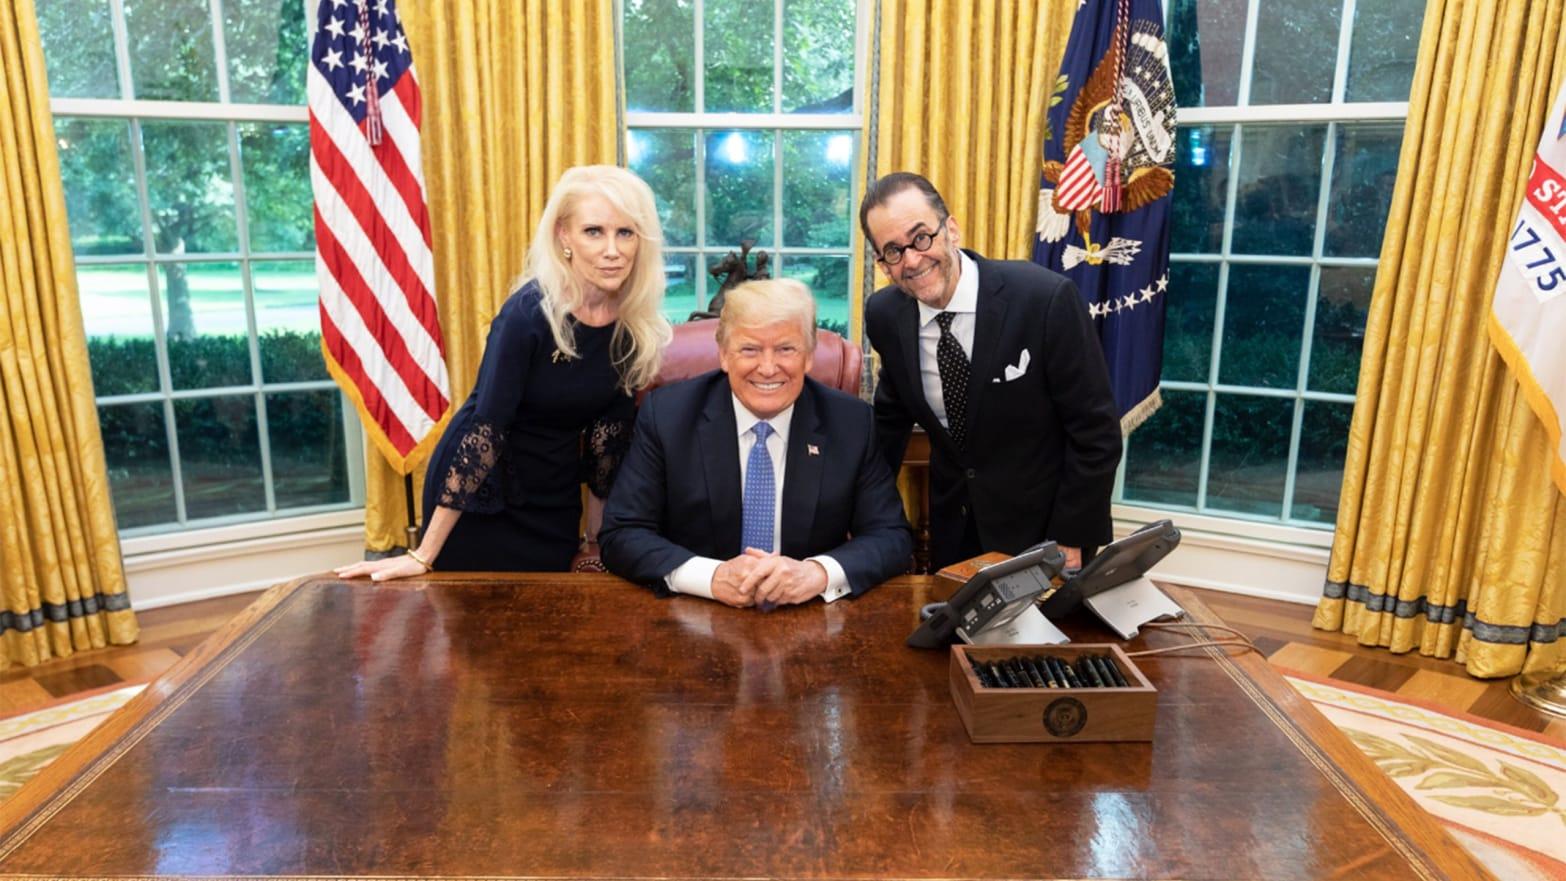 Trump Meets QAnon Kook Who Believes Democrats Run Pedophile Cult